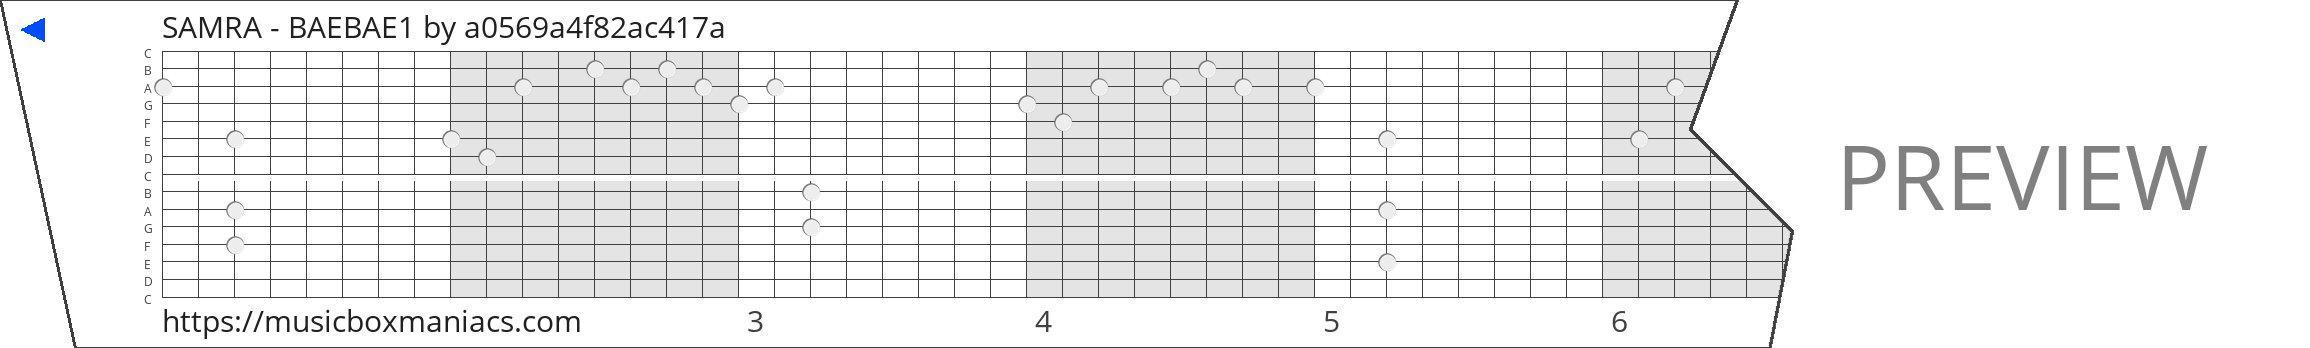 SAMRA - BAEBAE1 15 note music box paper strip